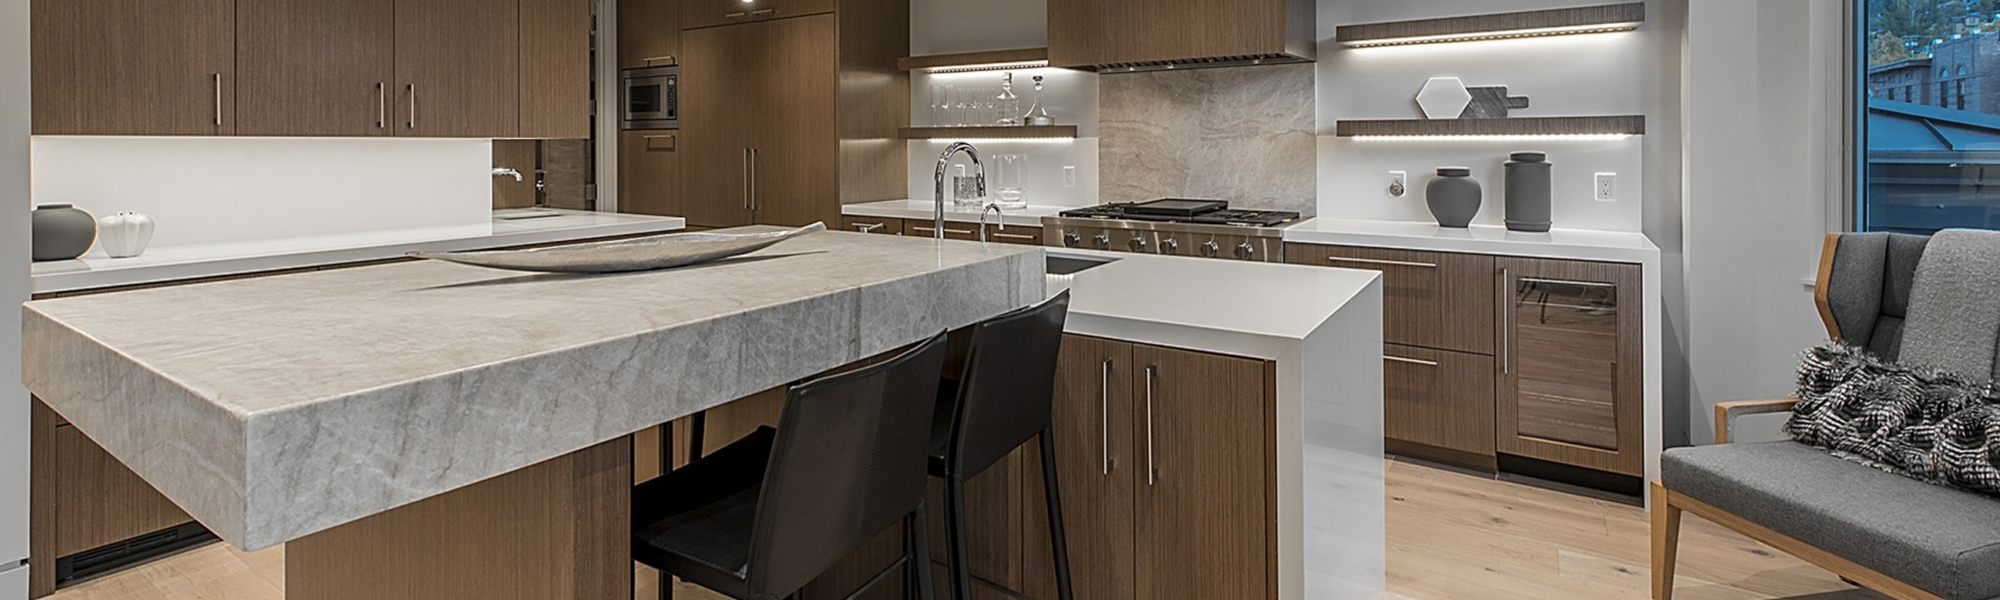 Fine Anvil Appliance Cabinets Insalt Lake City Brigham City Ut Download Free Architecture Designs Ponolprimenicaraguapropertycom